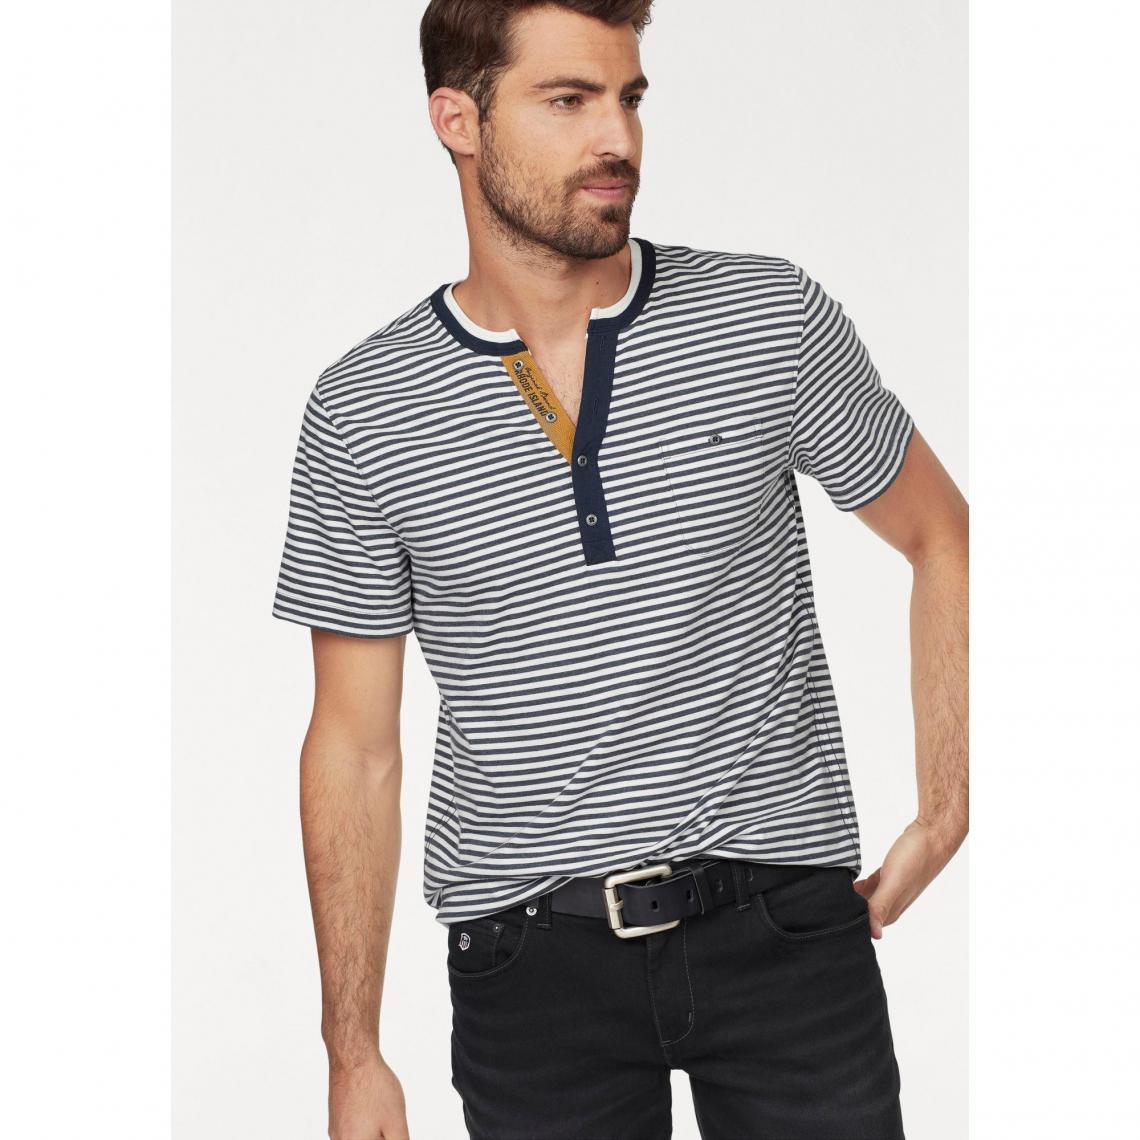 057ecb793aa05 T-shirt rayé manches courtes col rond boutonné homme Rhode Island ...